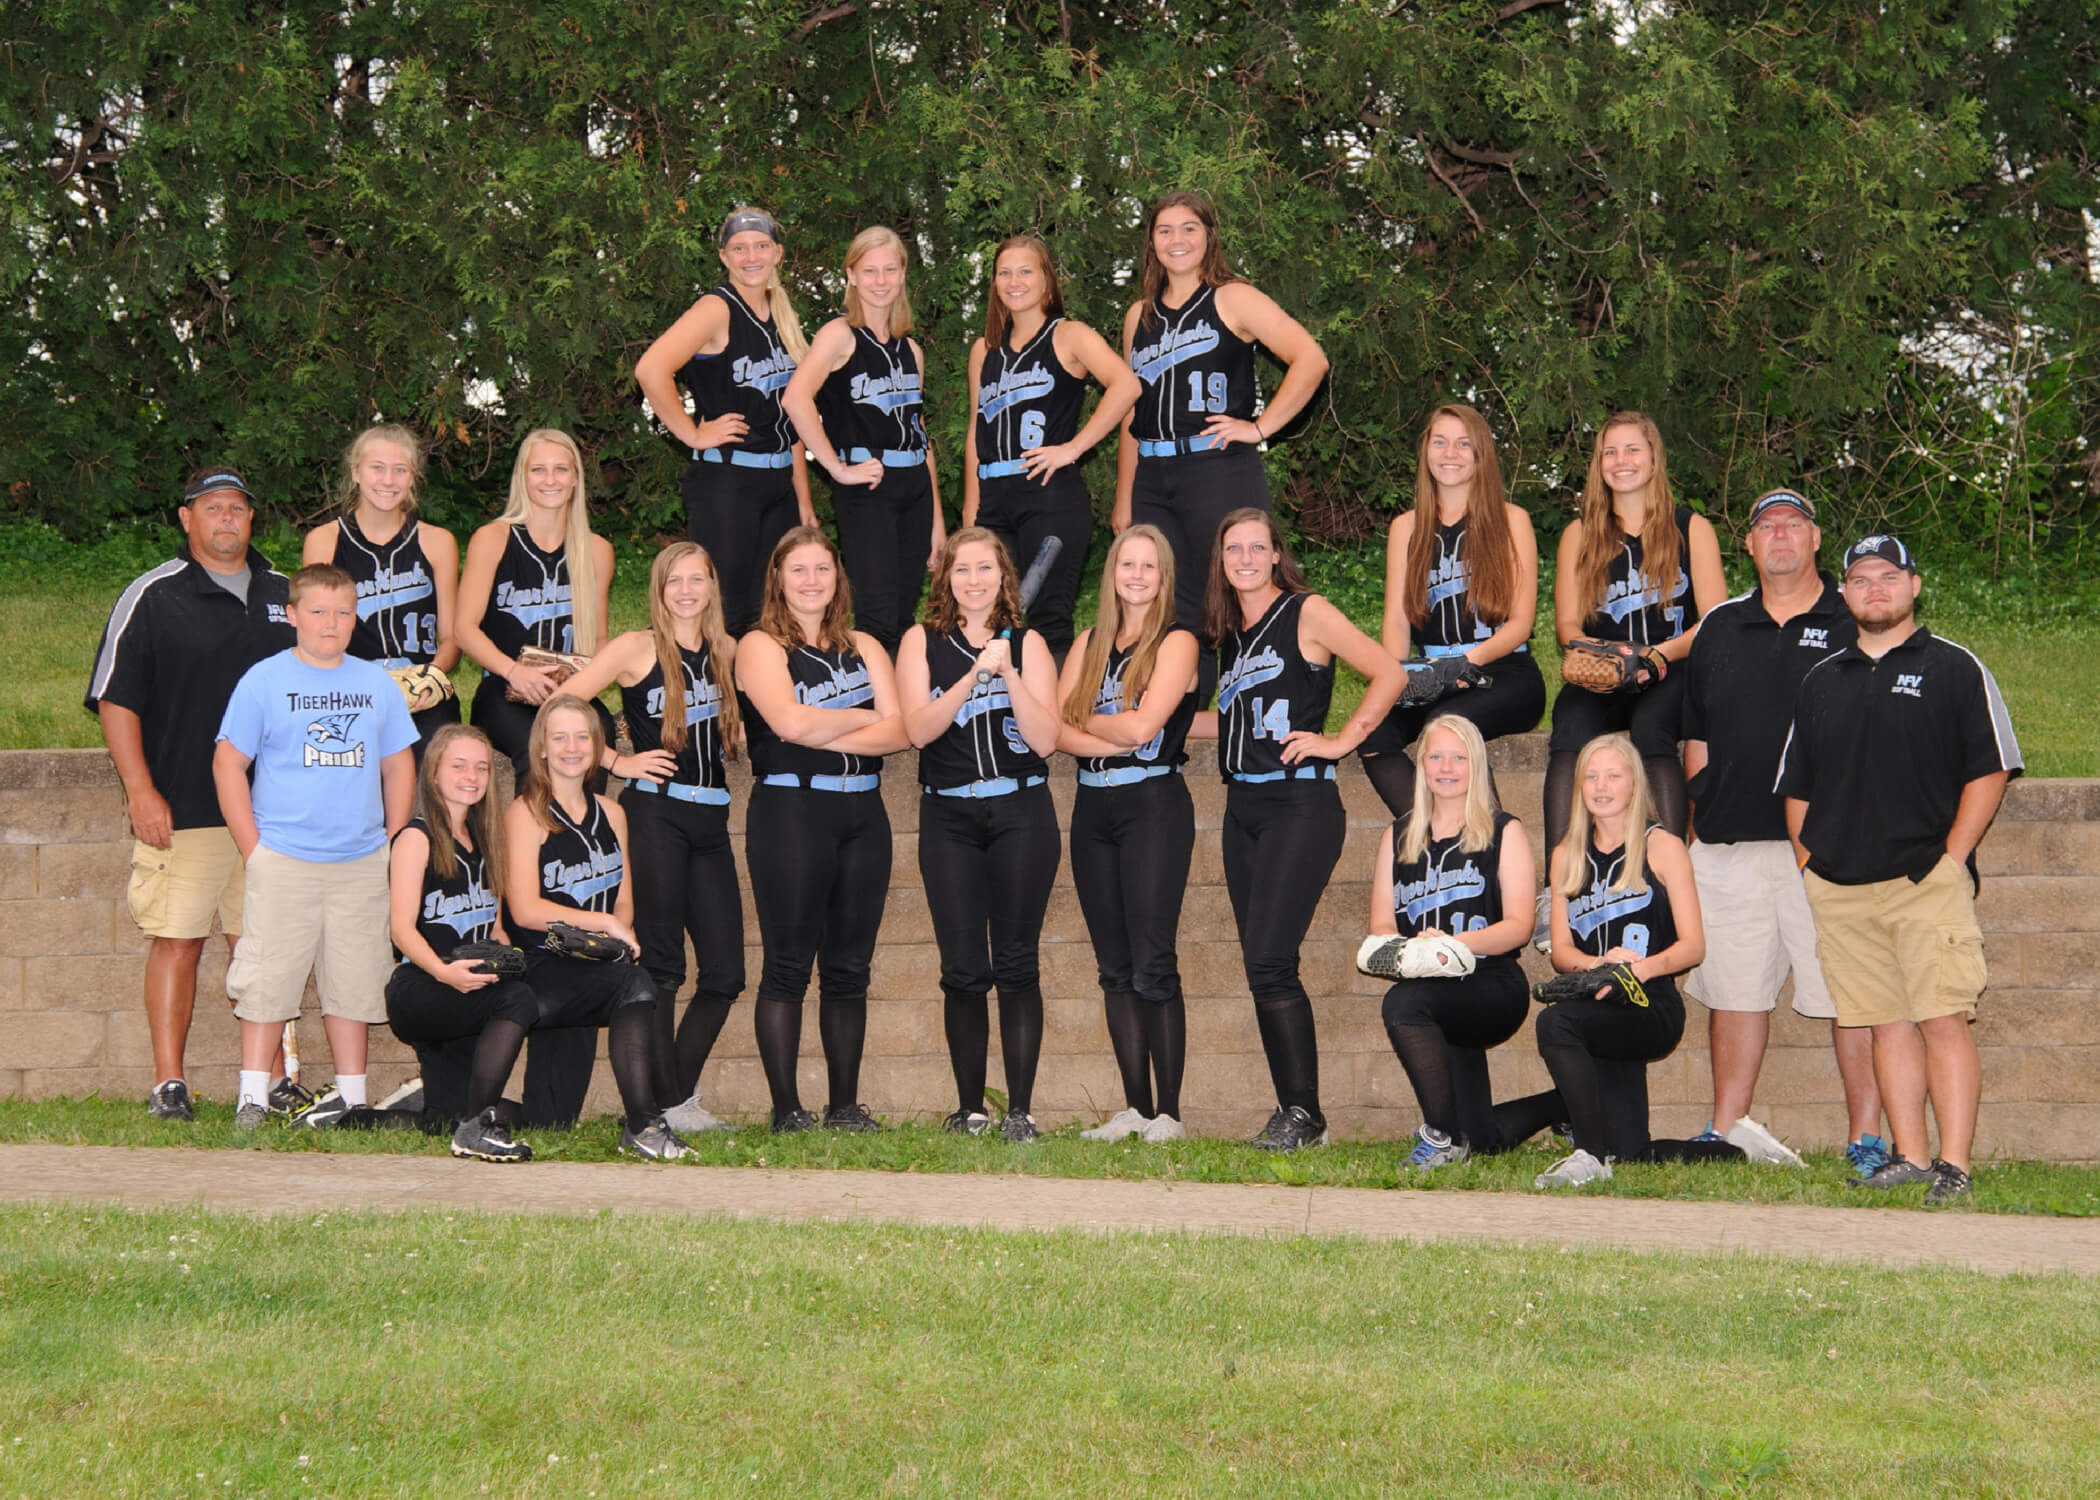 NFV High School Softball 2018 Varsity Team Photograph